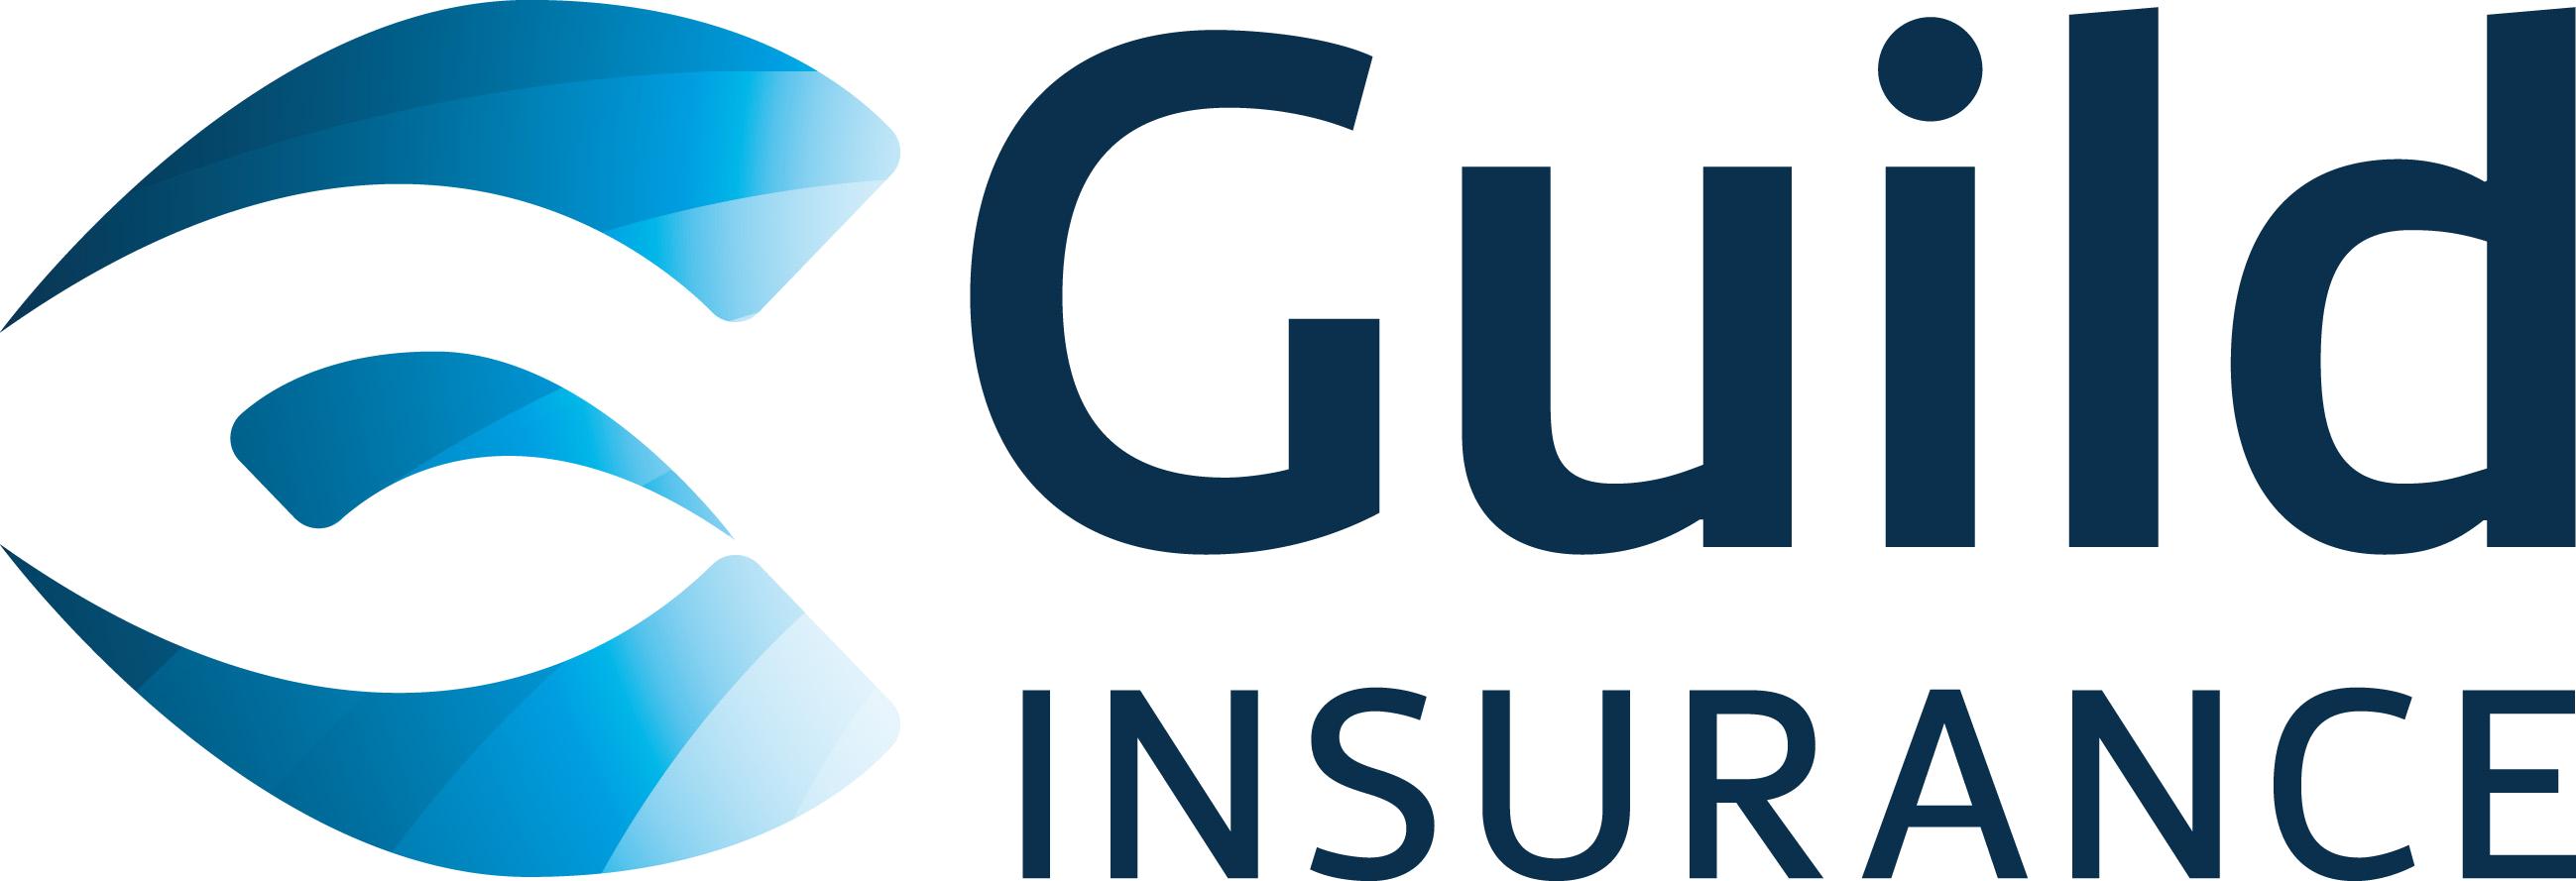 Podiatry Western Australia - Professional Insurance